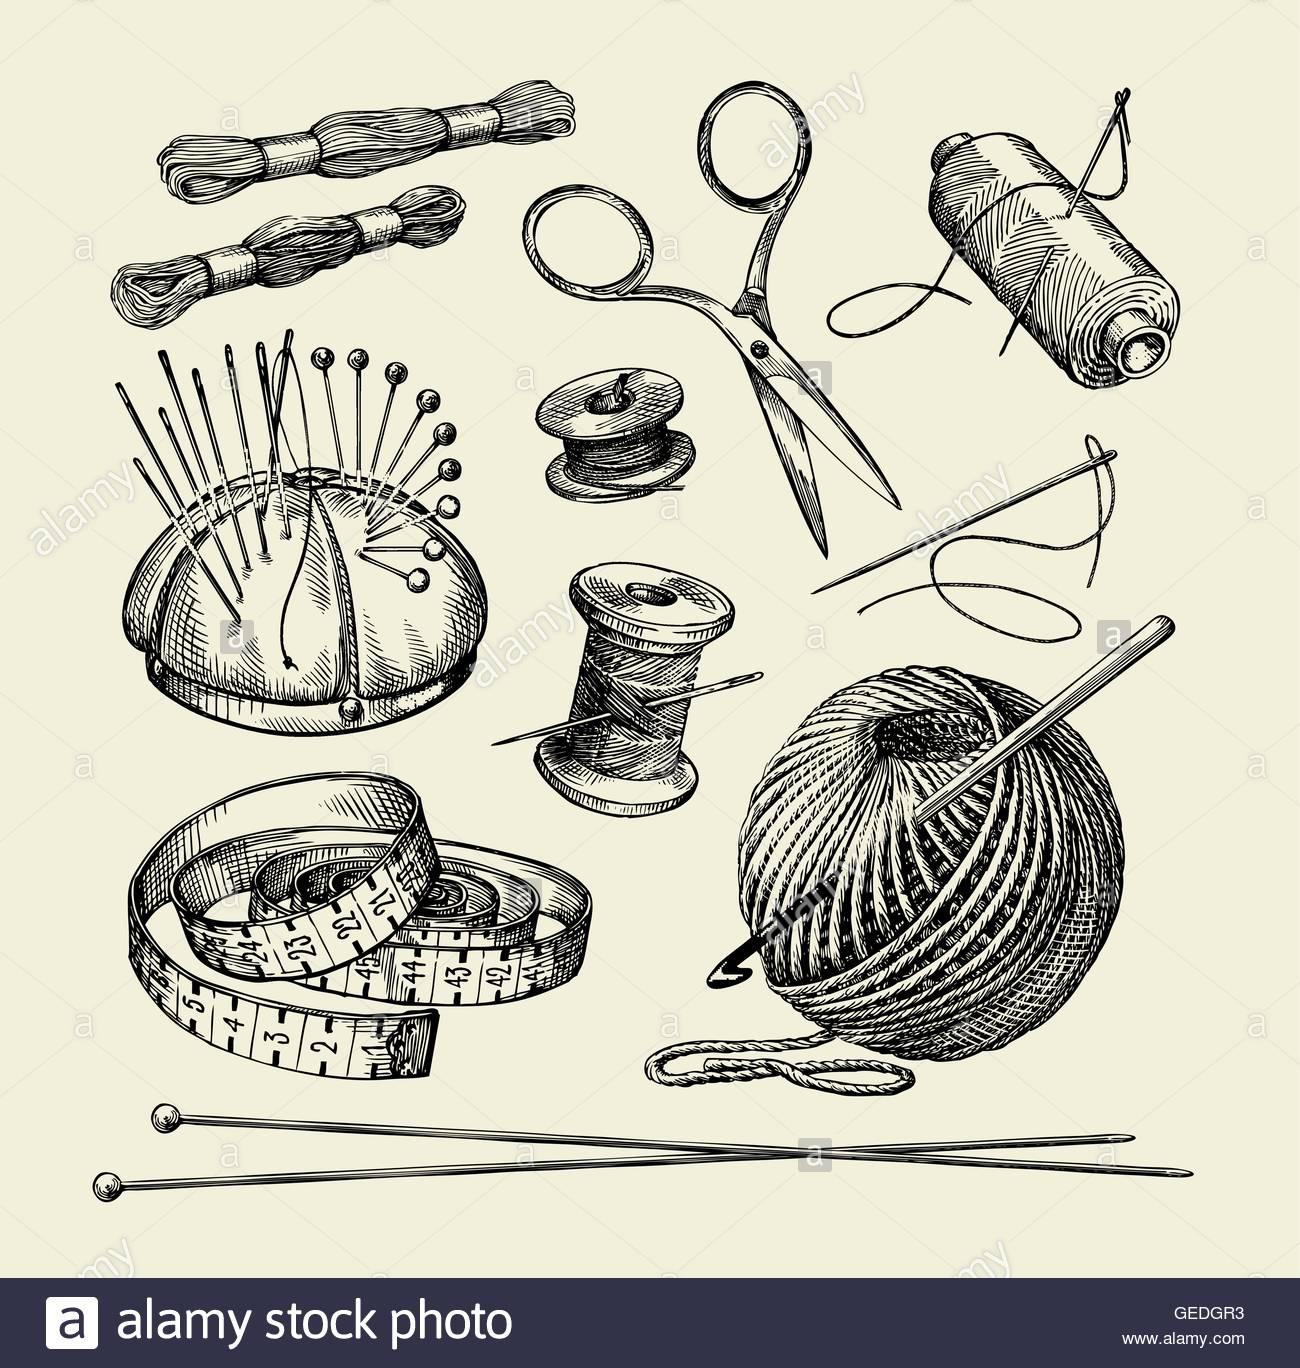 1300x1368 Sewing Notions. Hand Drawn Thread, Needle, Scissors, Yarn